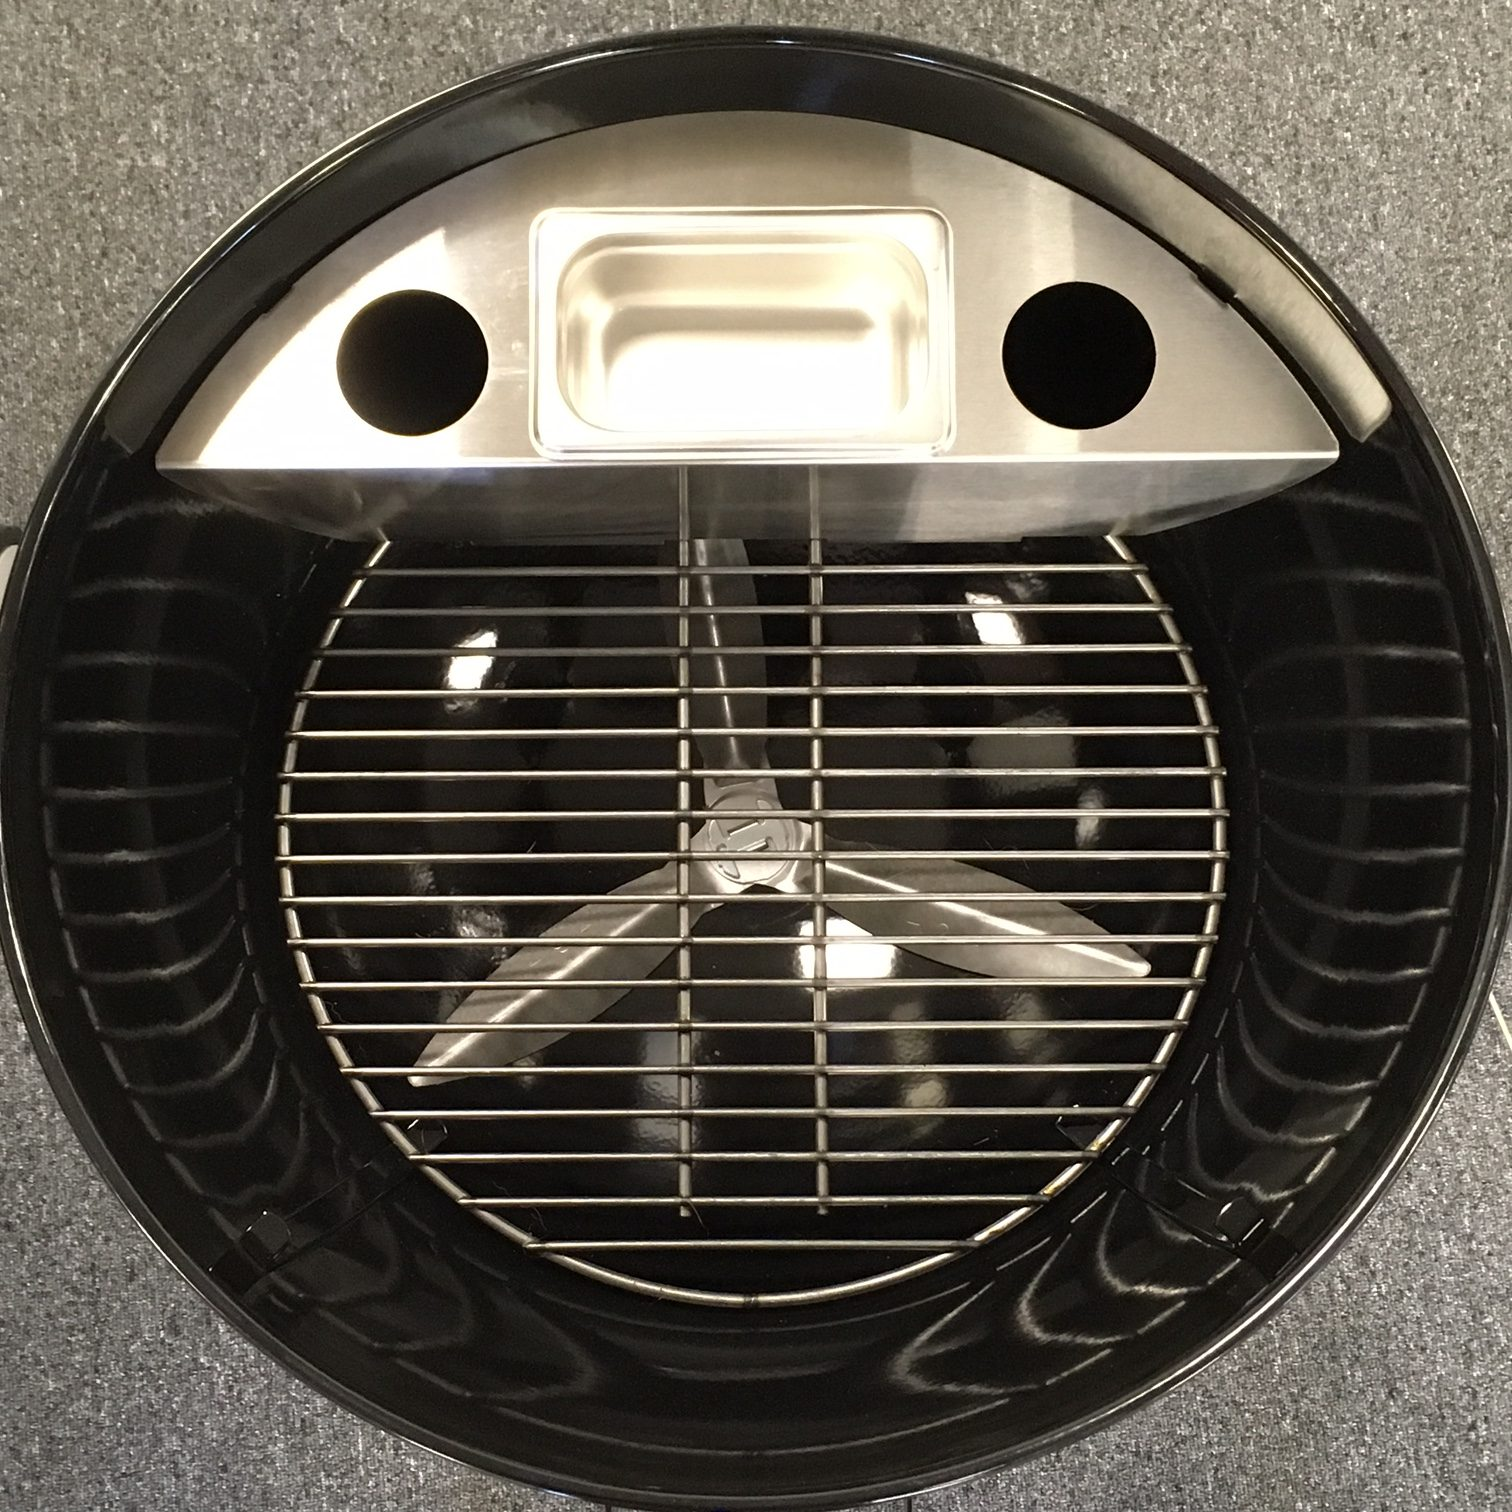 smokenator 1000 smoker kit for weber 22 inch charcoal grills smokenator. Black Bedroom Furniture Sets. Home Design Ideas